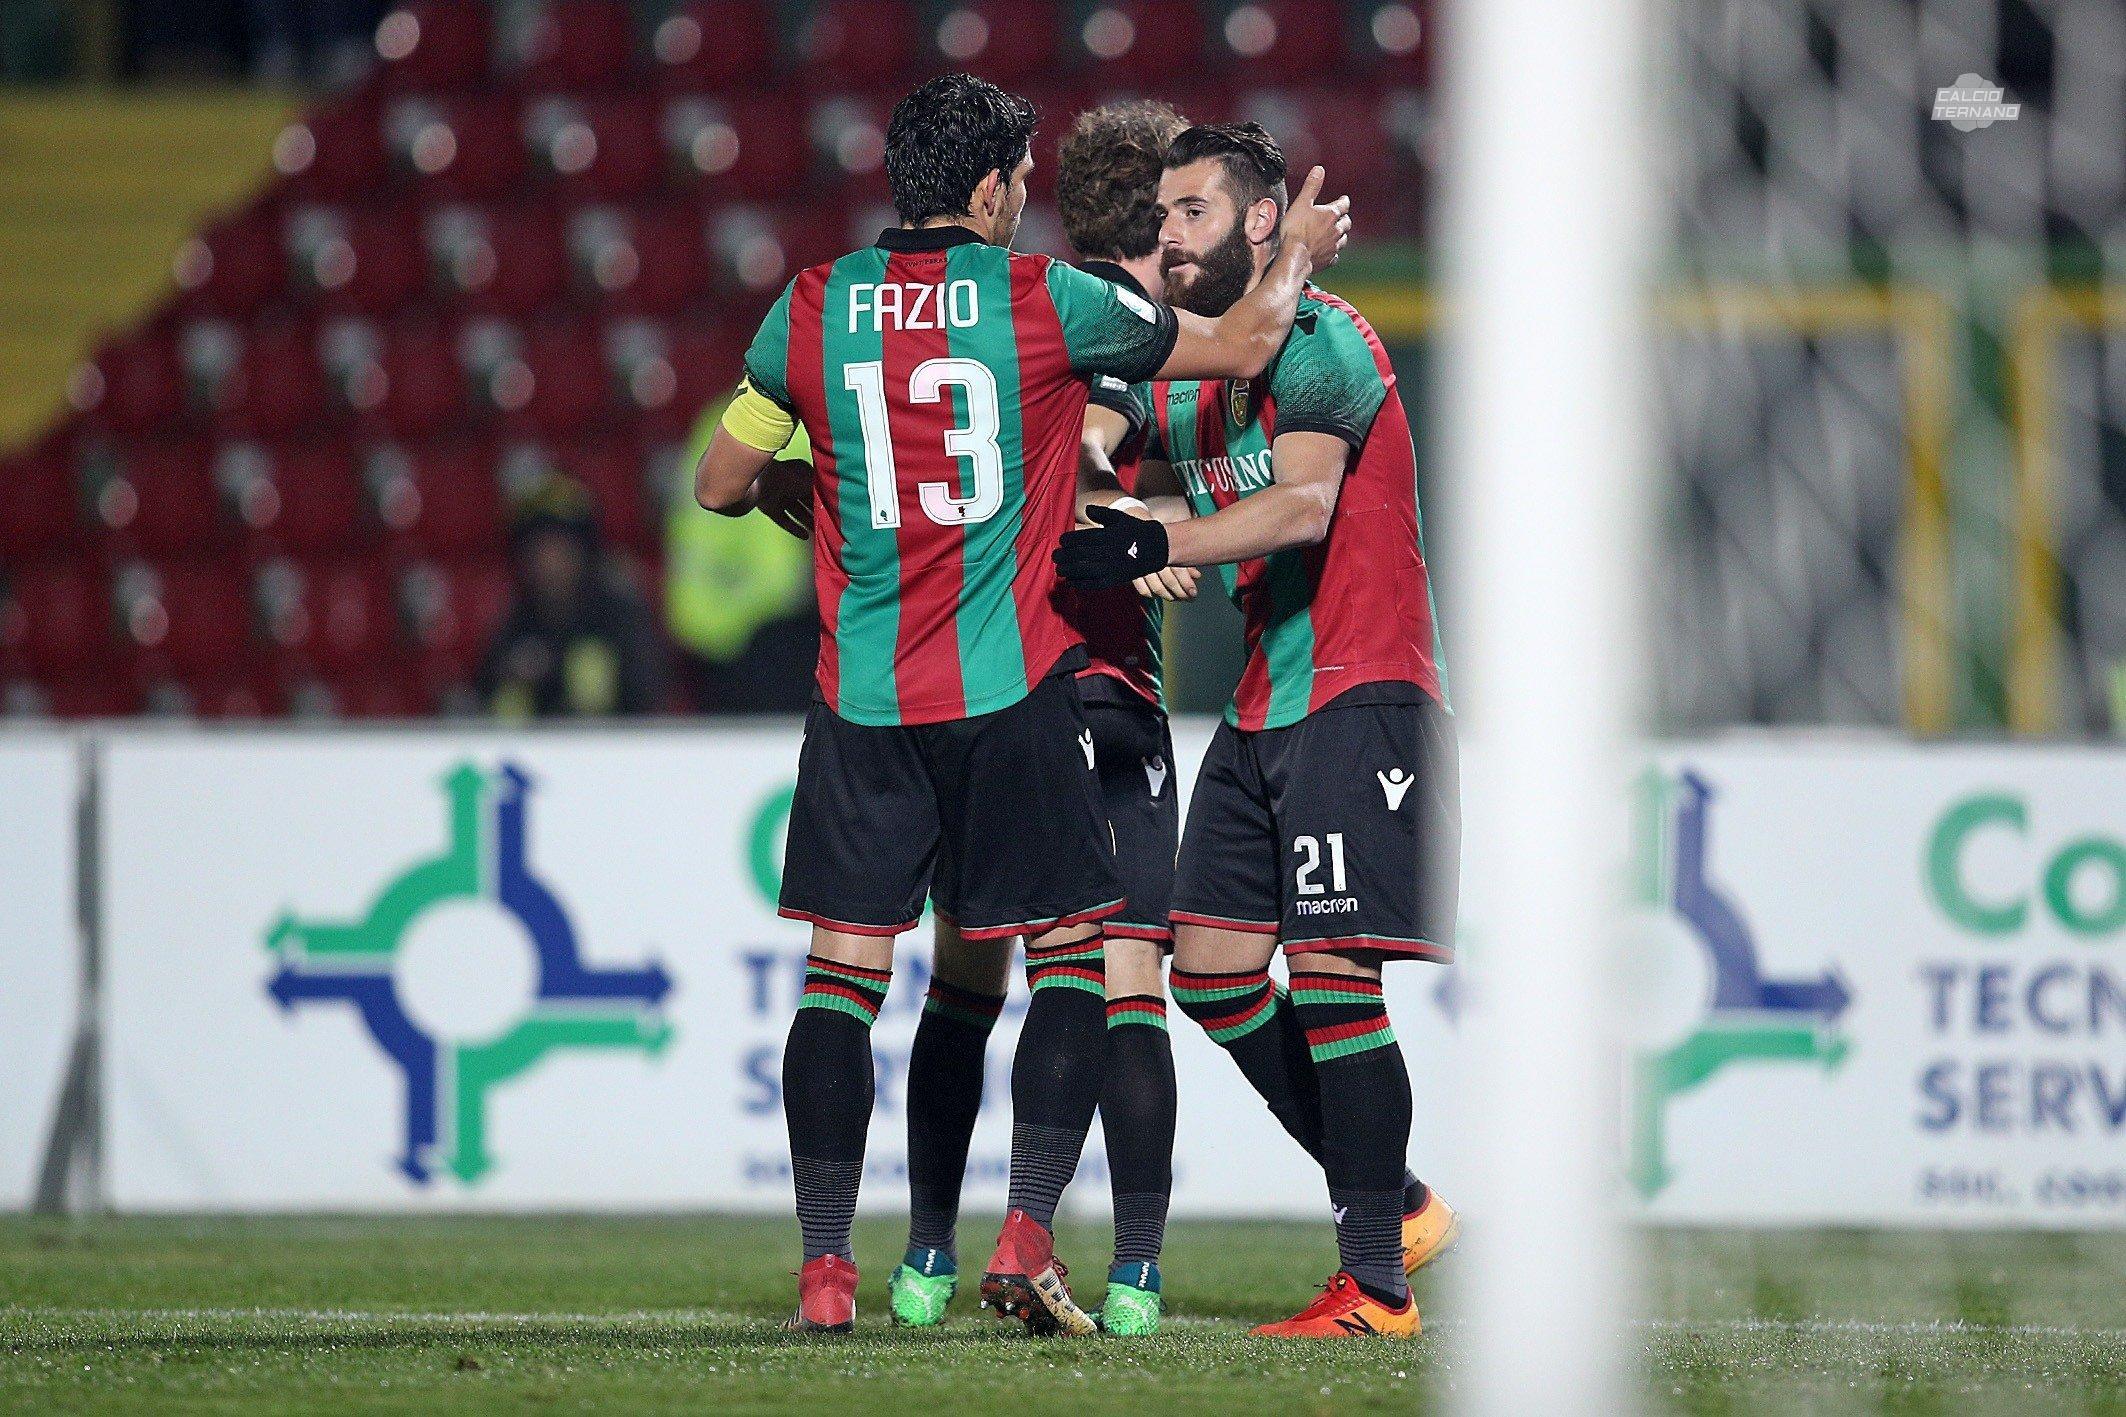 Lega Pro Girone B Ternana-Fermana, probabili formazioni